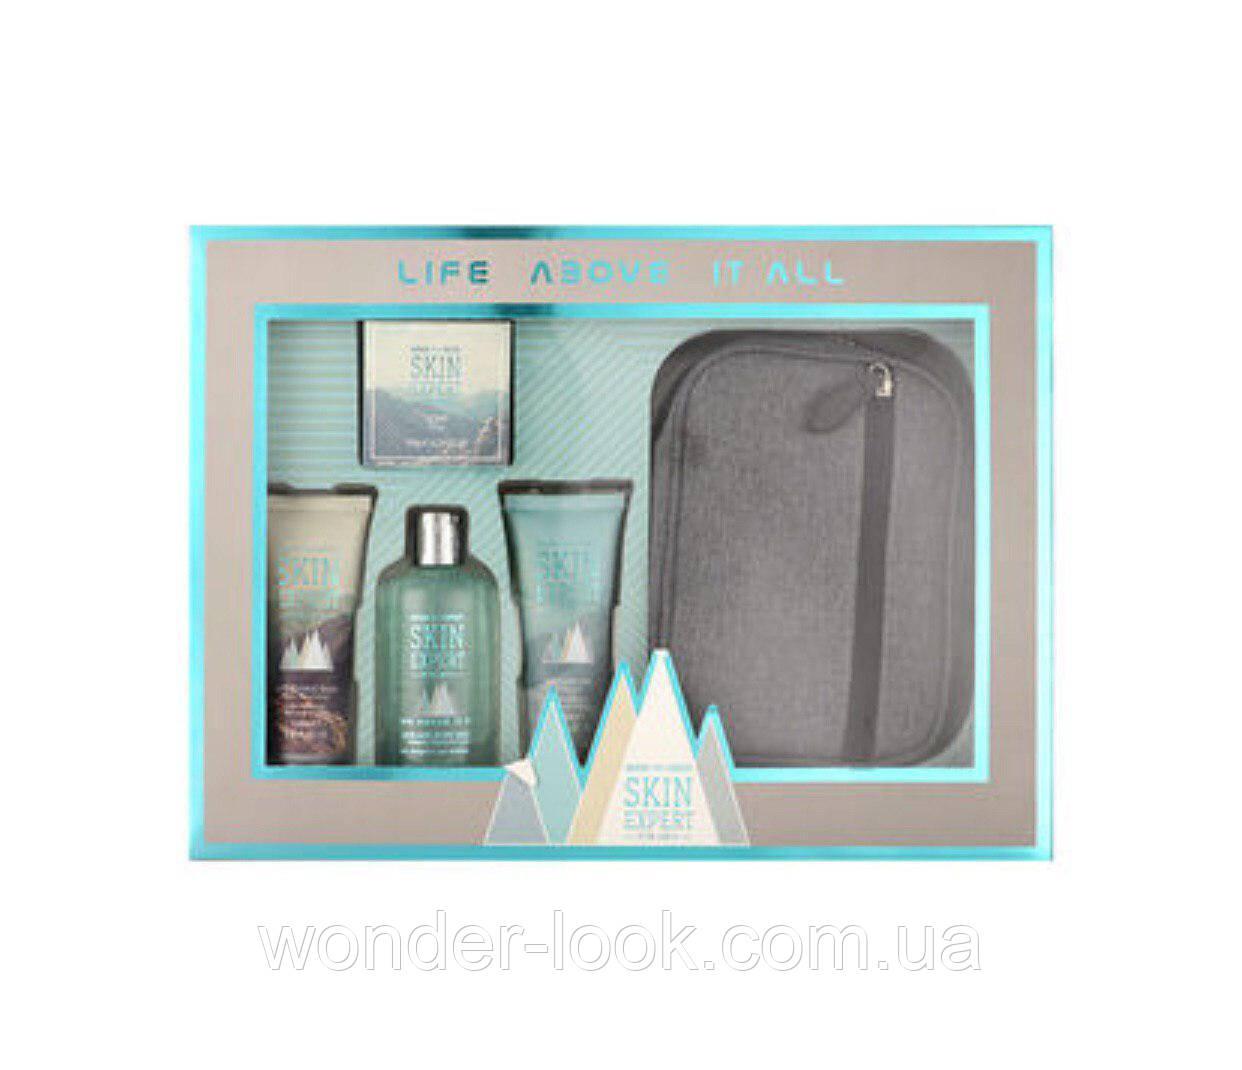 Мужской подарочный набор Style & Grace Skin Expert Essential Travel Collection Gift